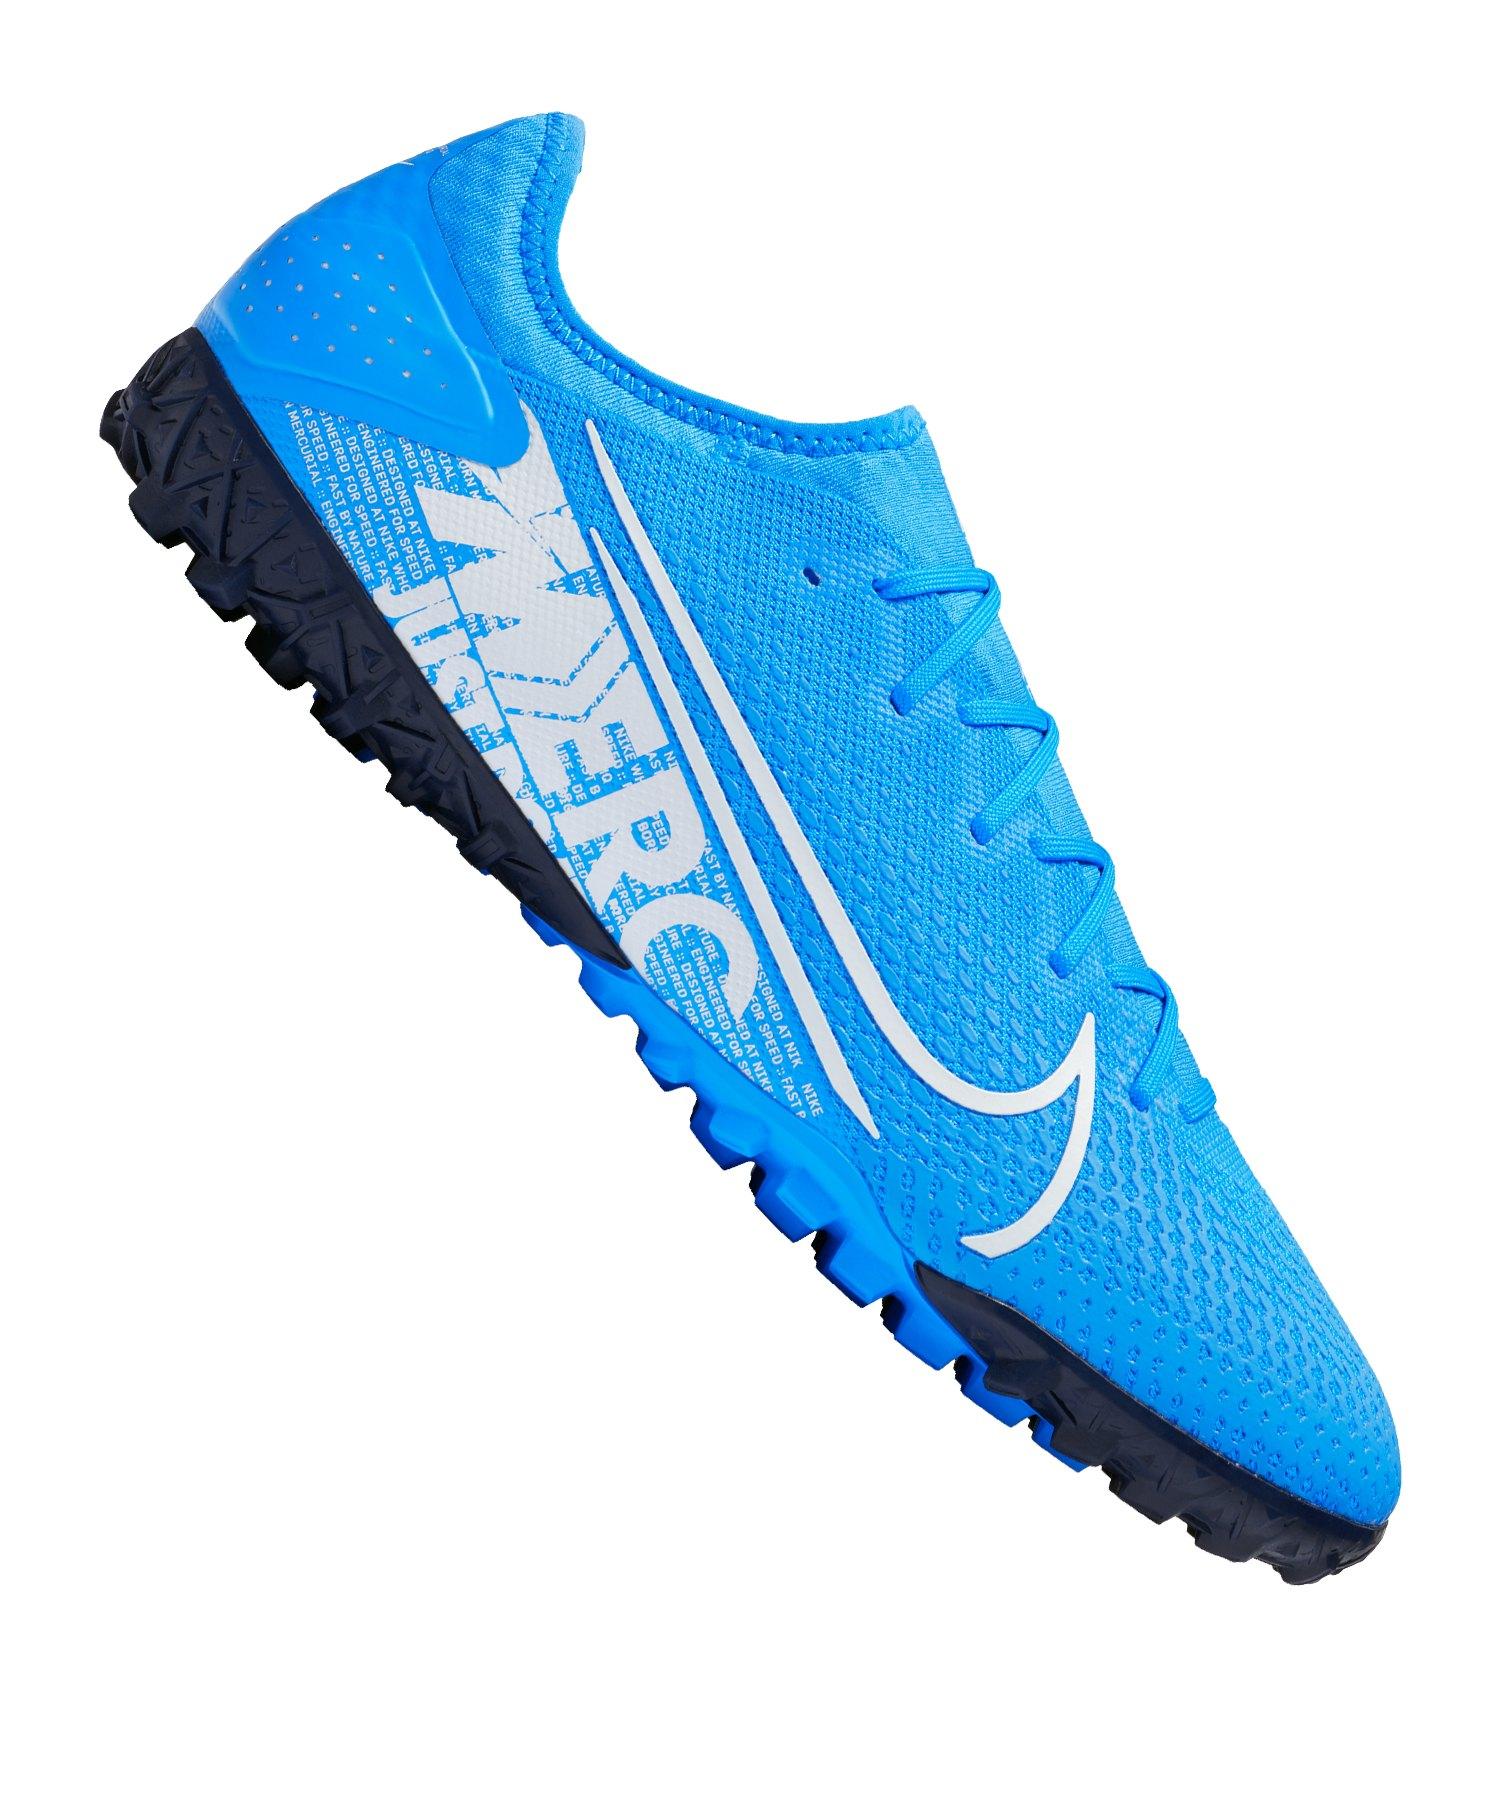 Nike Mercurial Vapor XIII Pro TF Blau Weiss F414